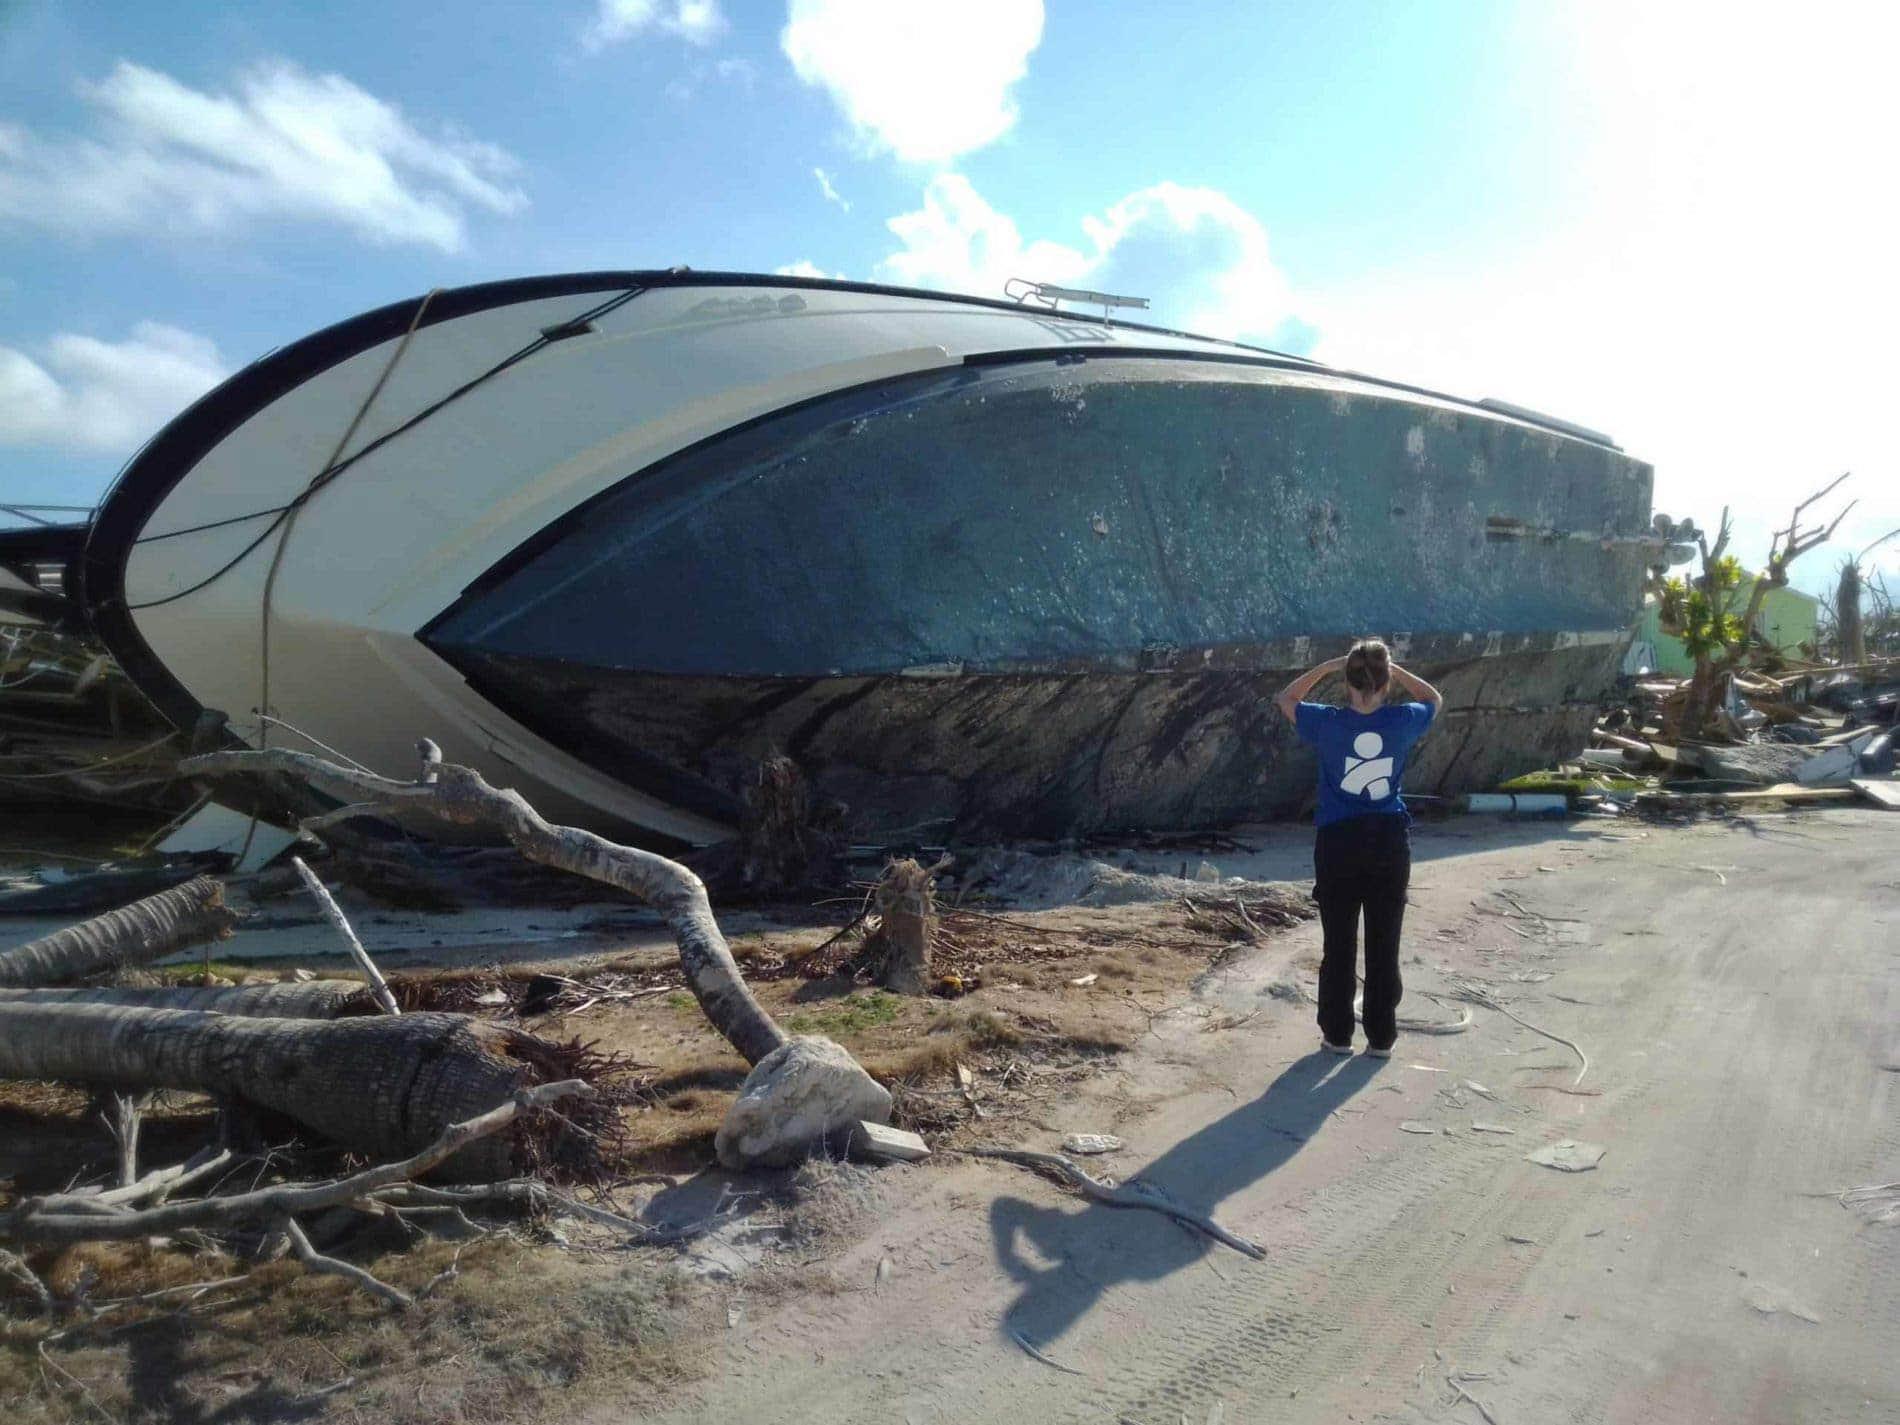 Bahamas Hopetown Americares worker looks at debris and boat damage